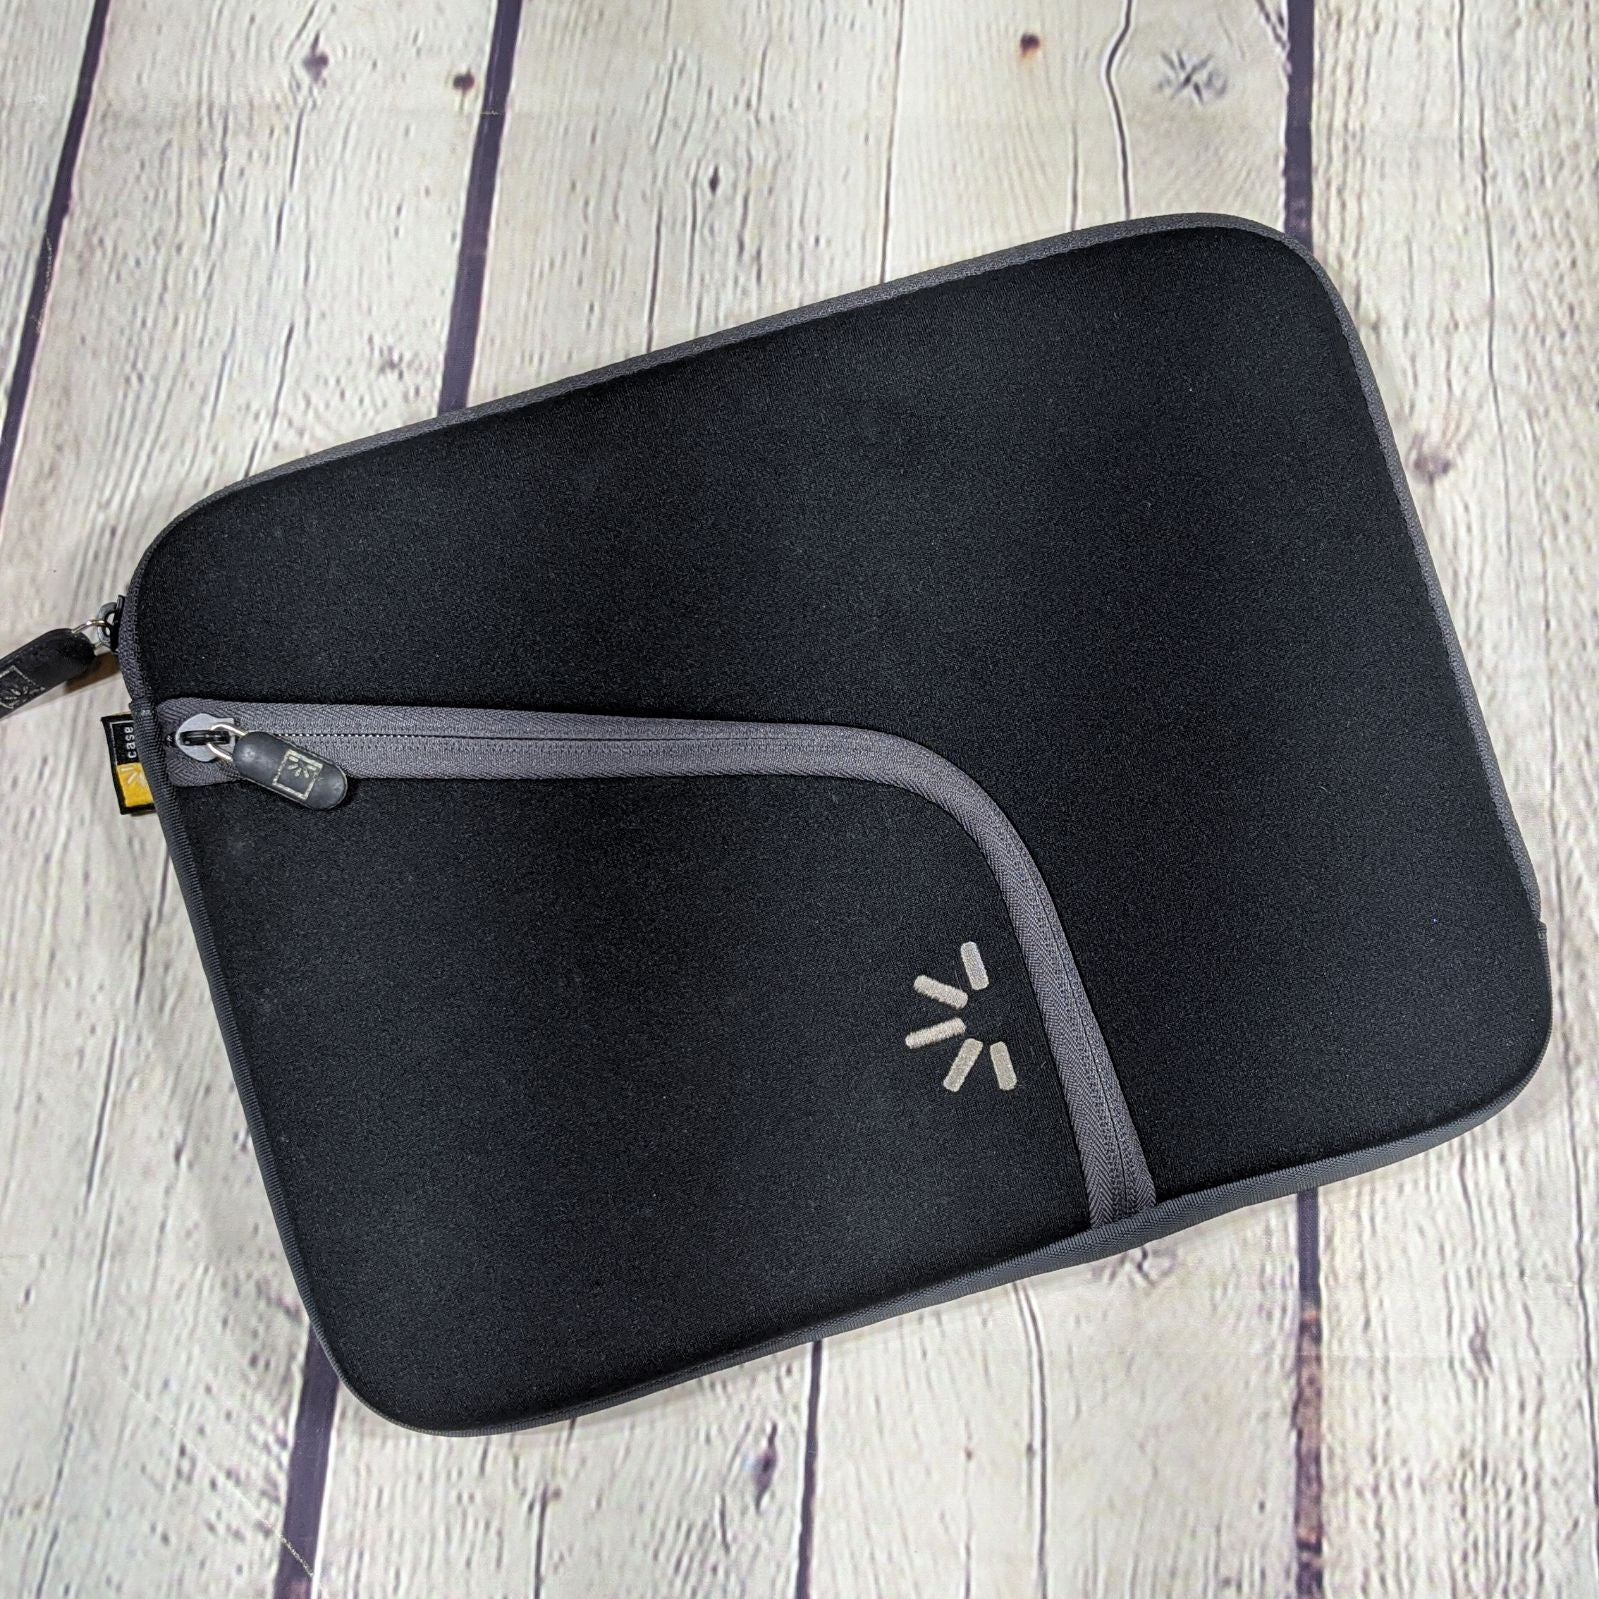 Case Logic Tablet Mini Notebook Case